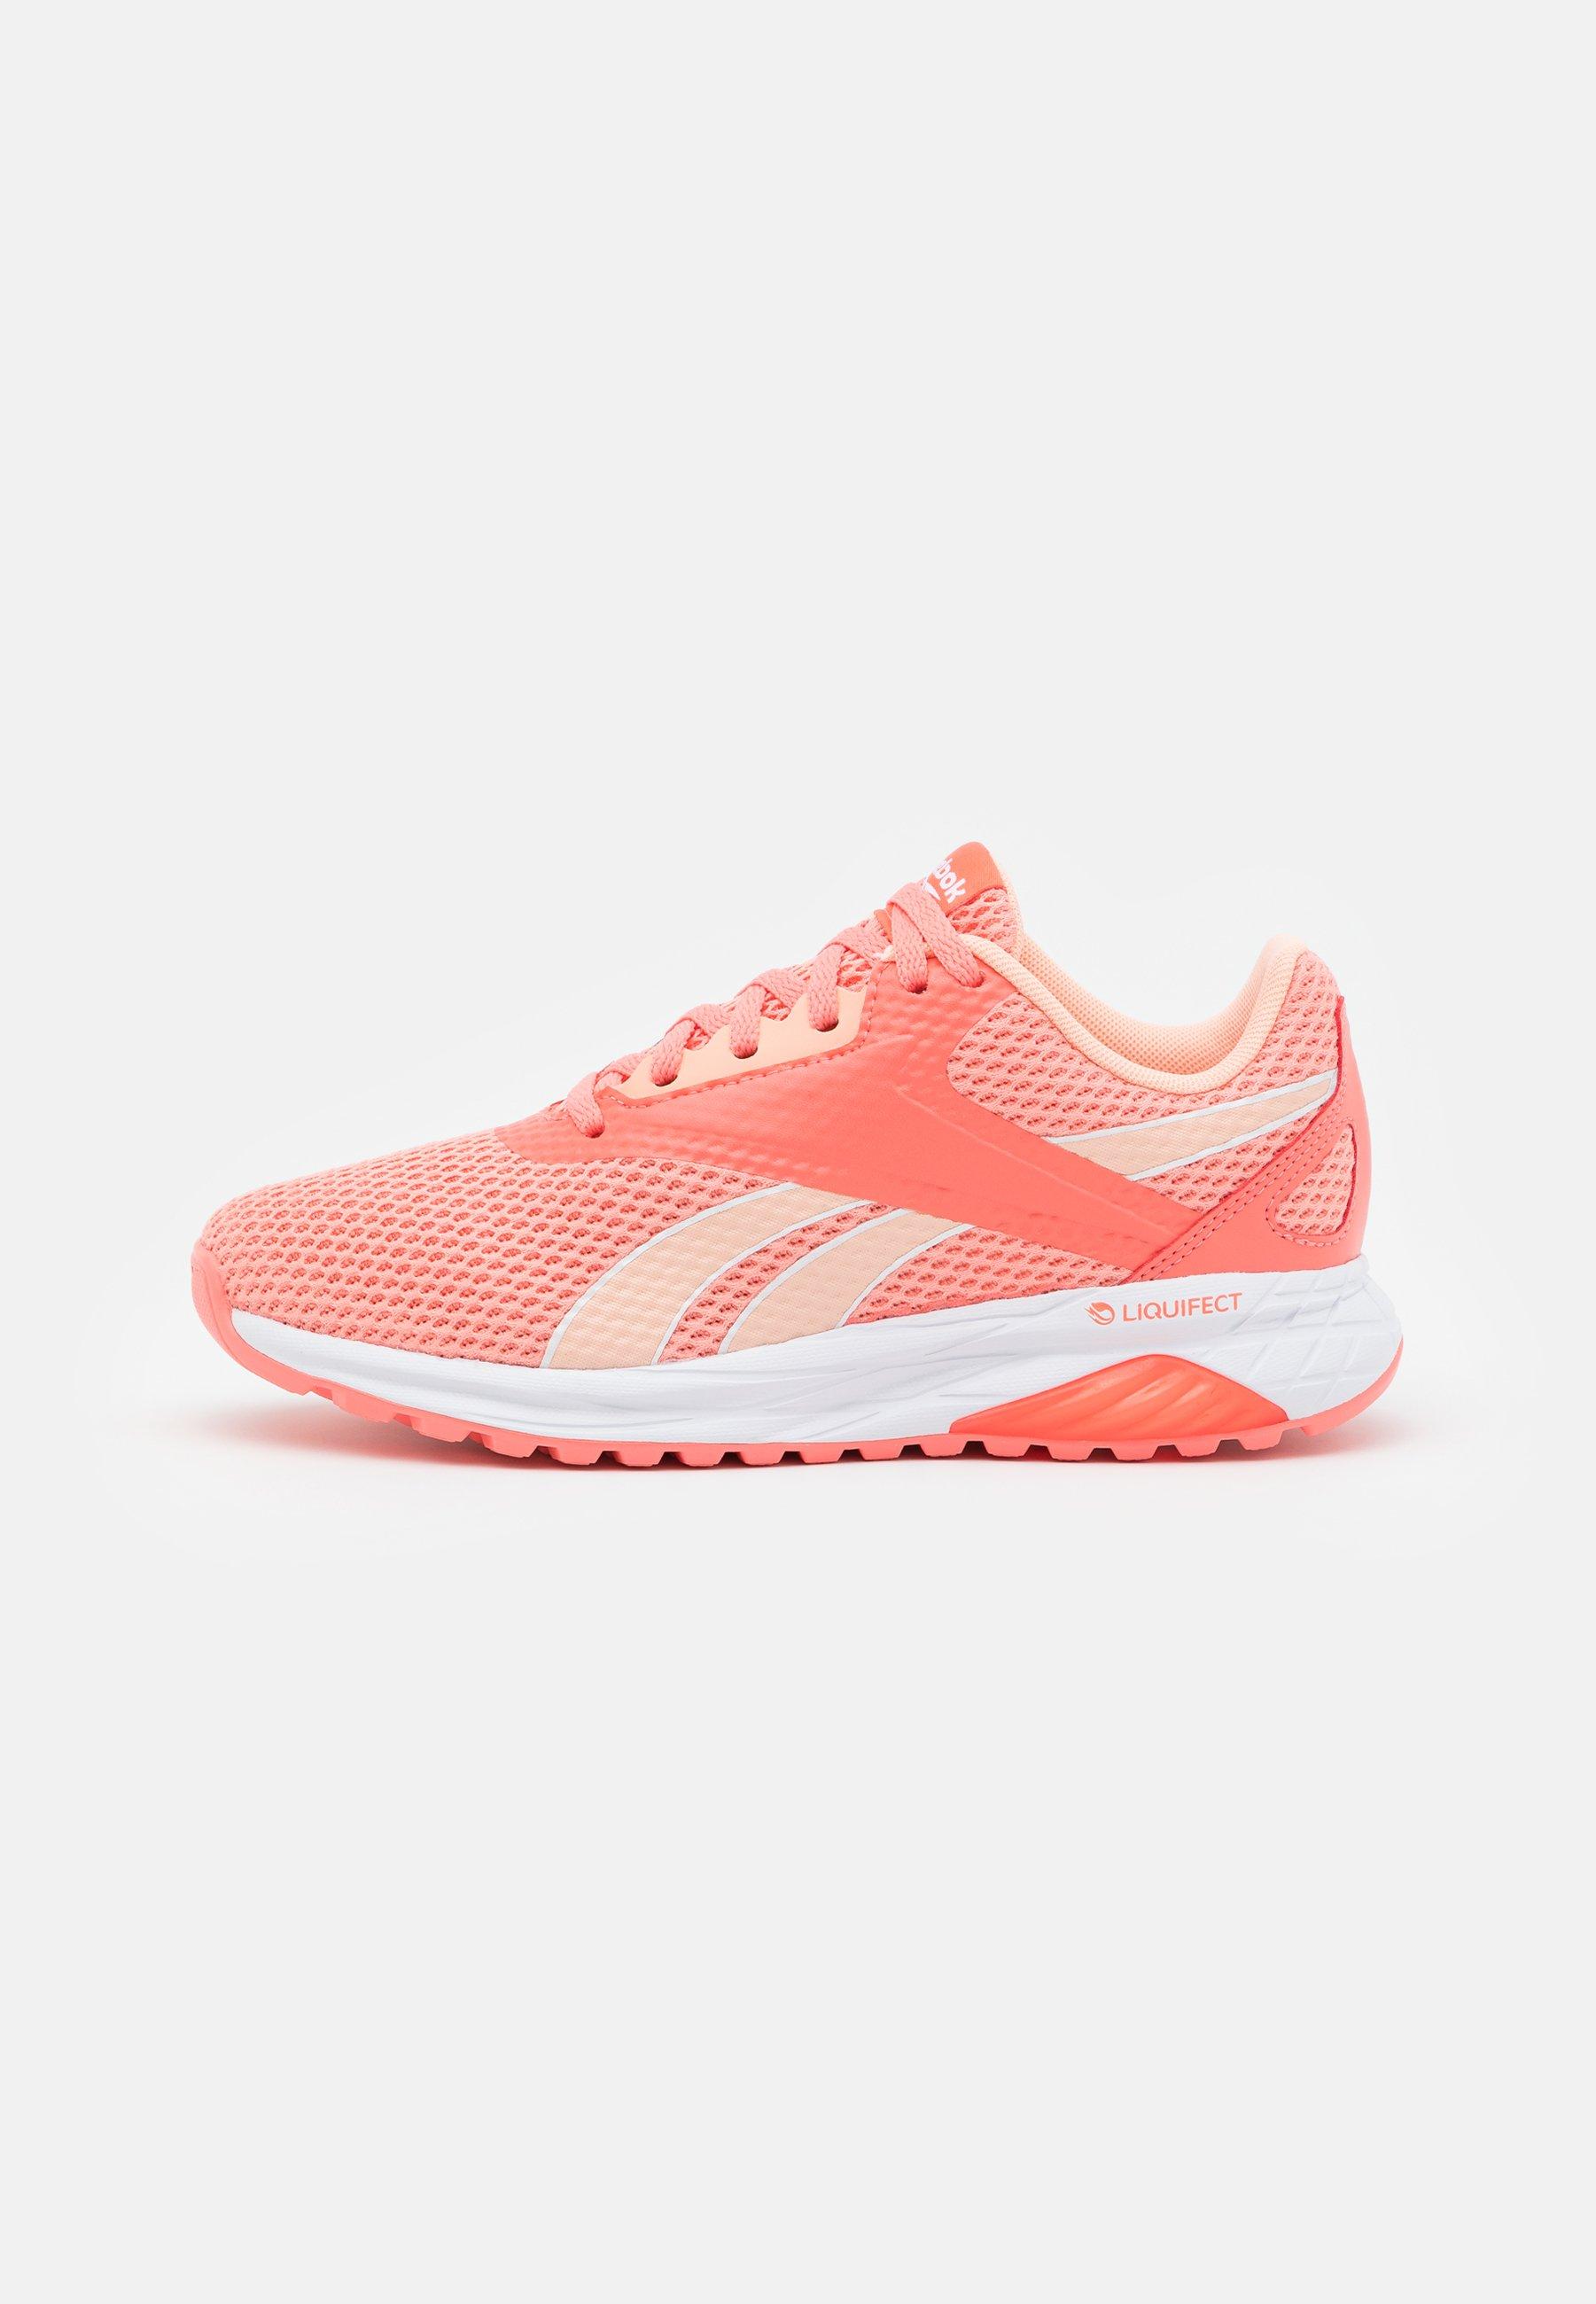 Reebok Liquifect 90 Neutral Running Shoes Coral Orange Coral Zalando De